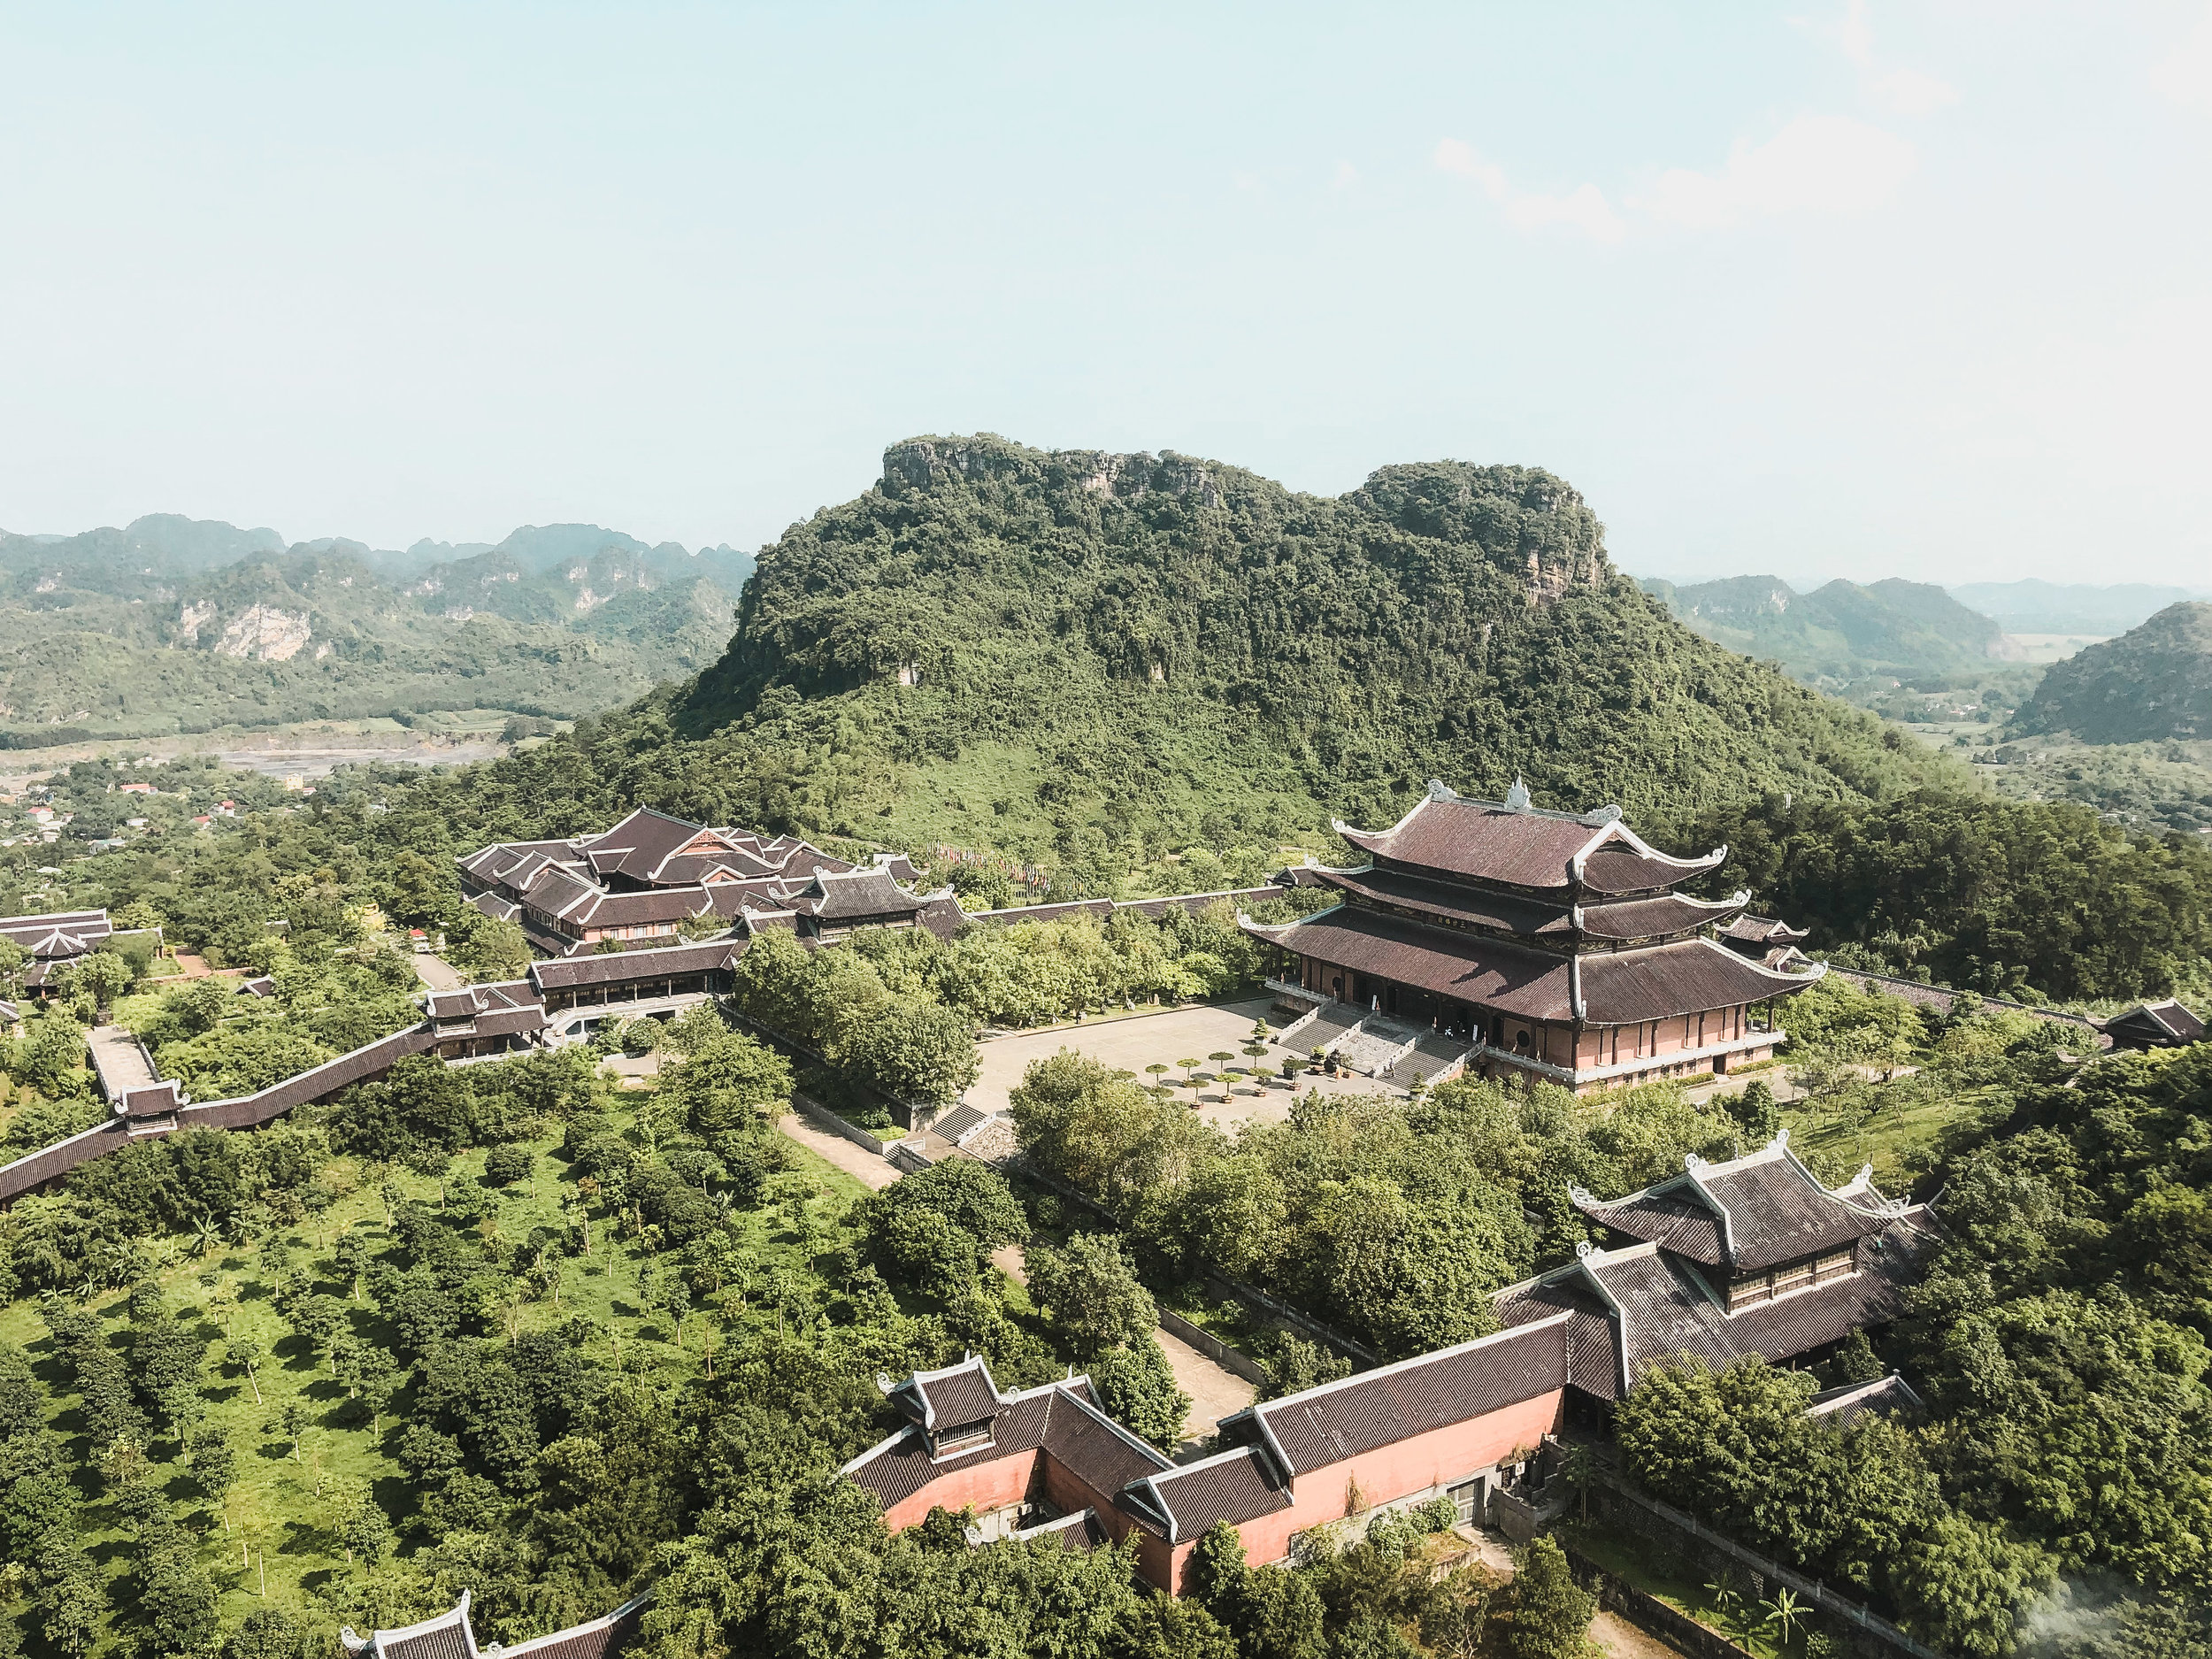 Bai Dinh Temple near Ninh Binh